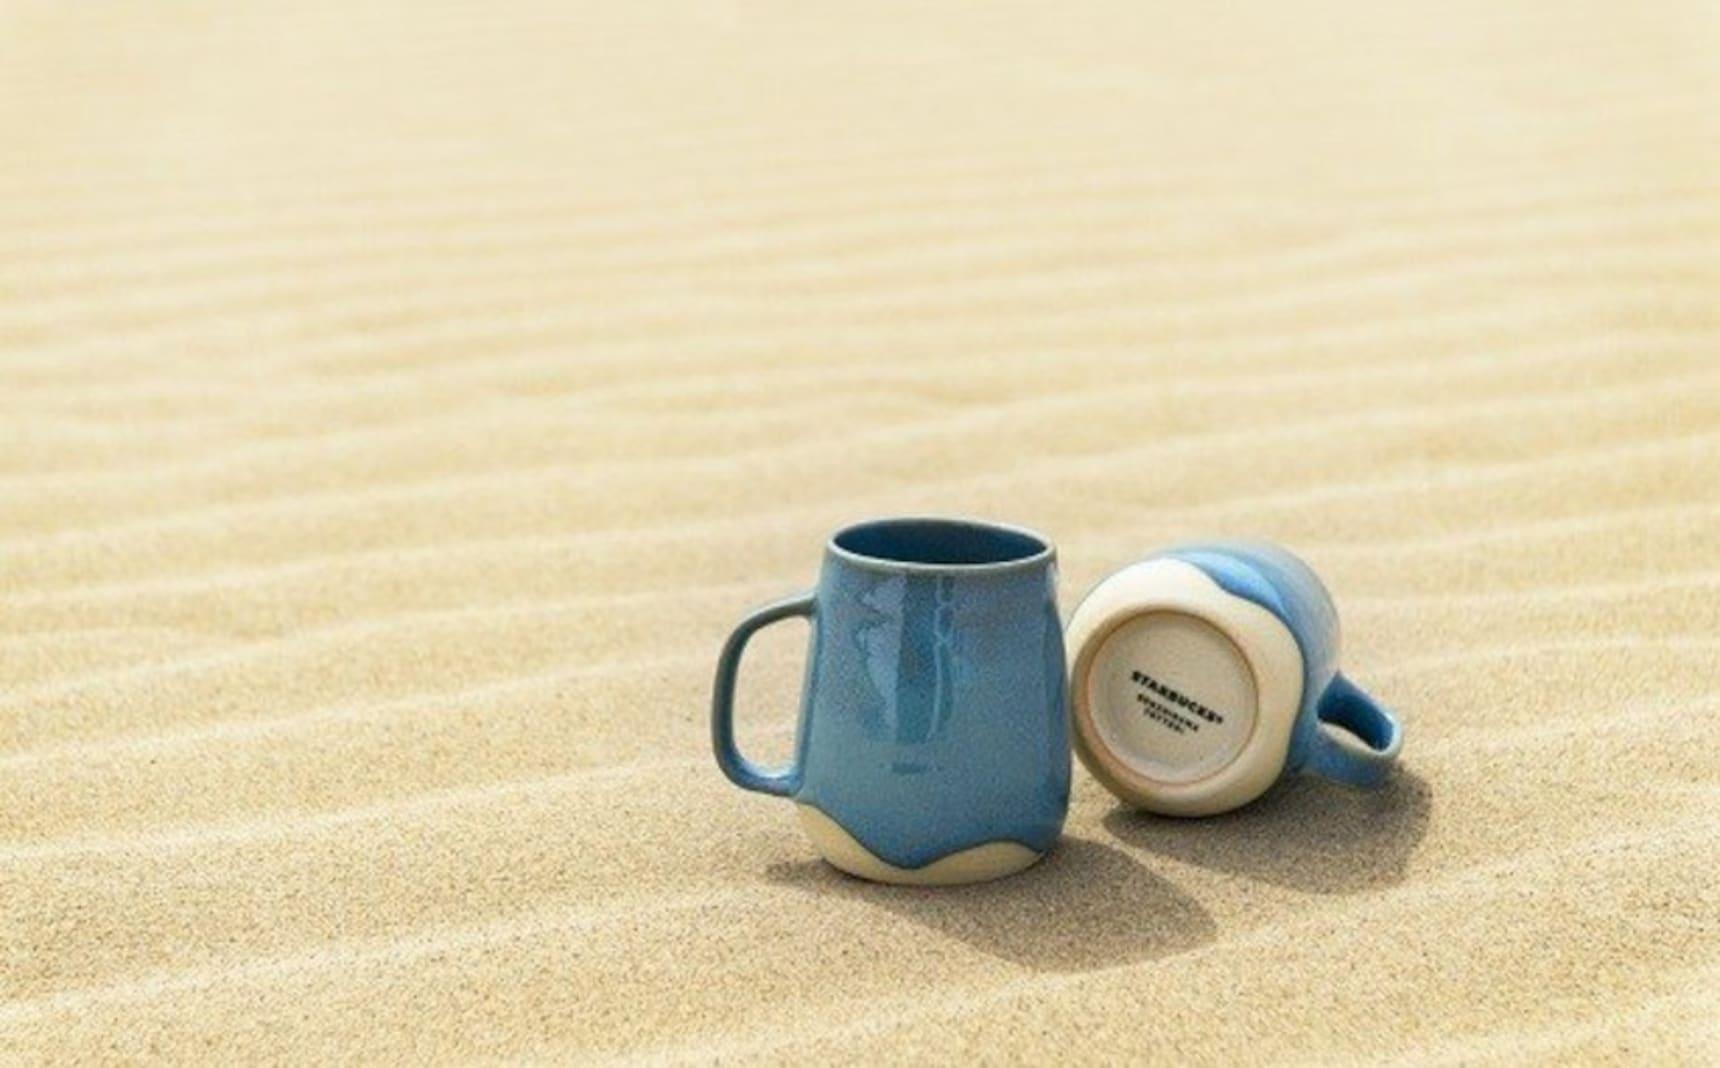 Special Starbucks Mugs Showcase Local Artisans